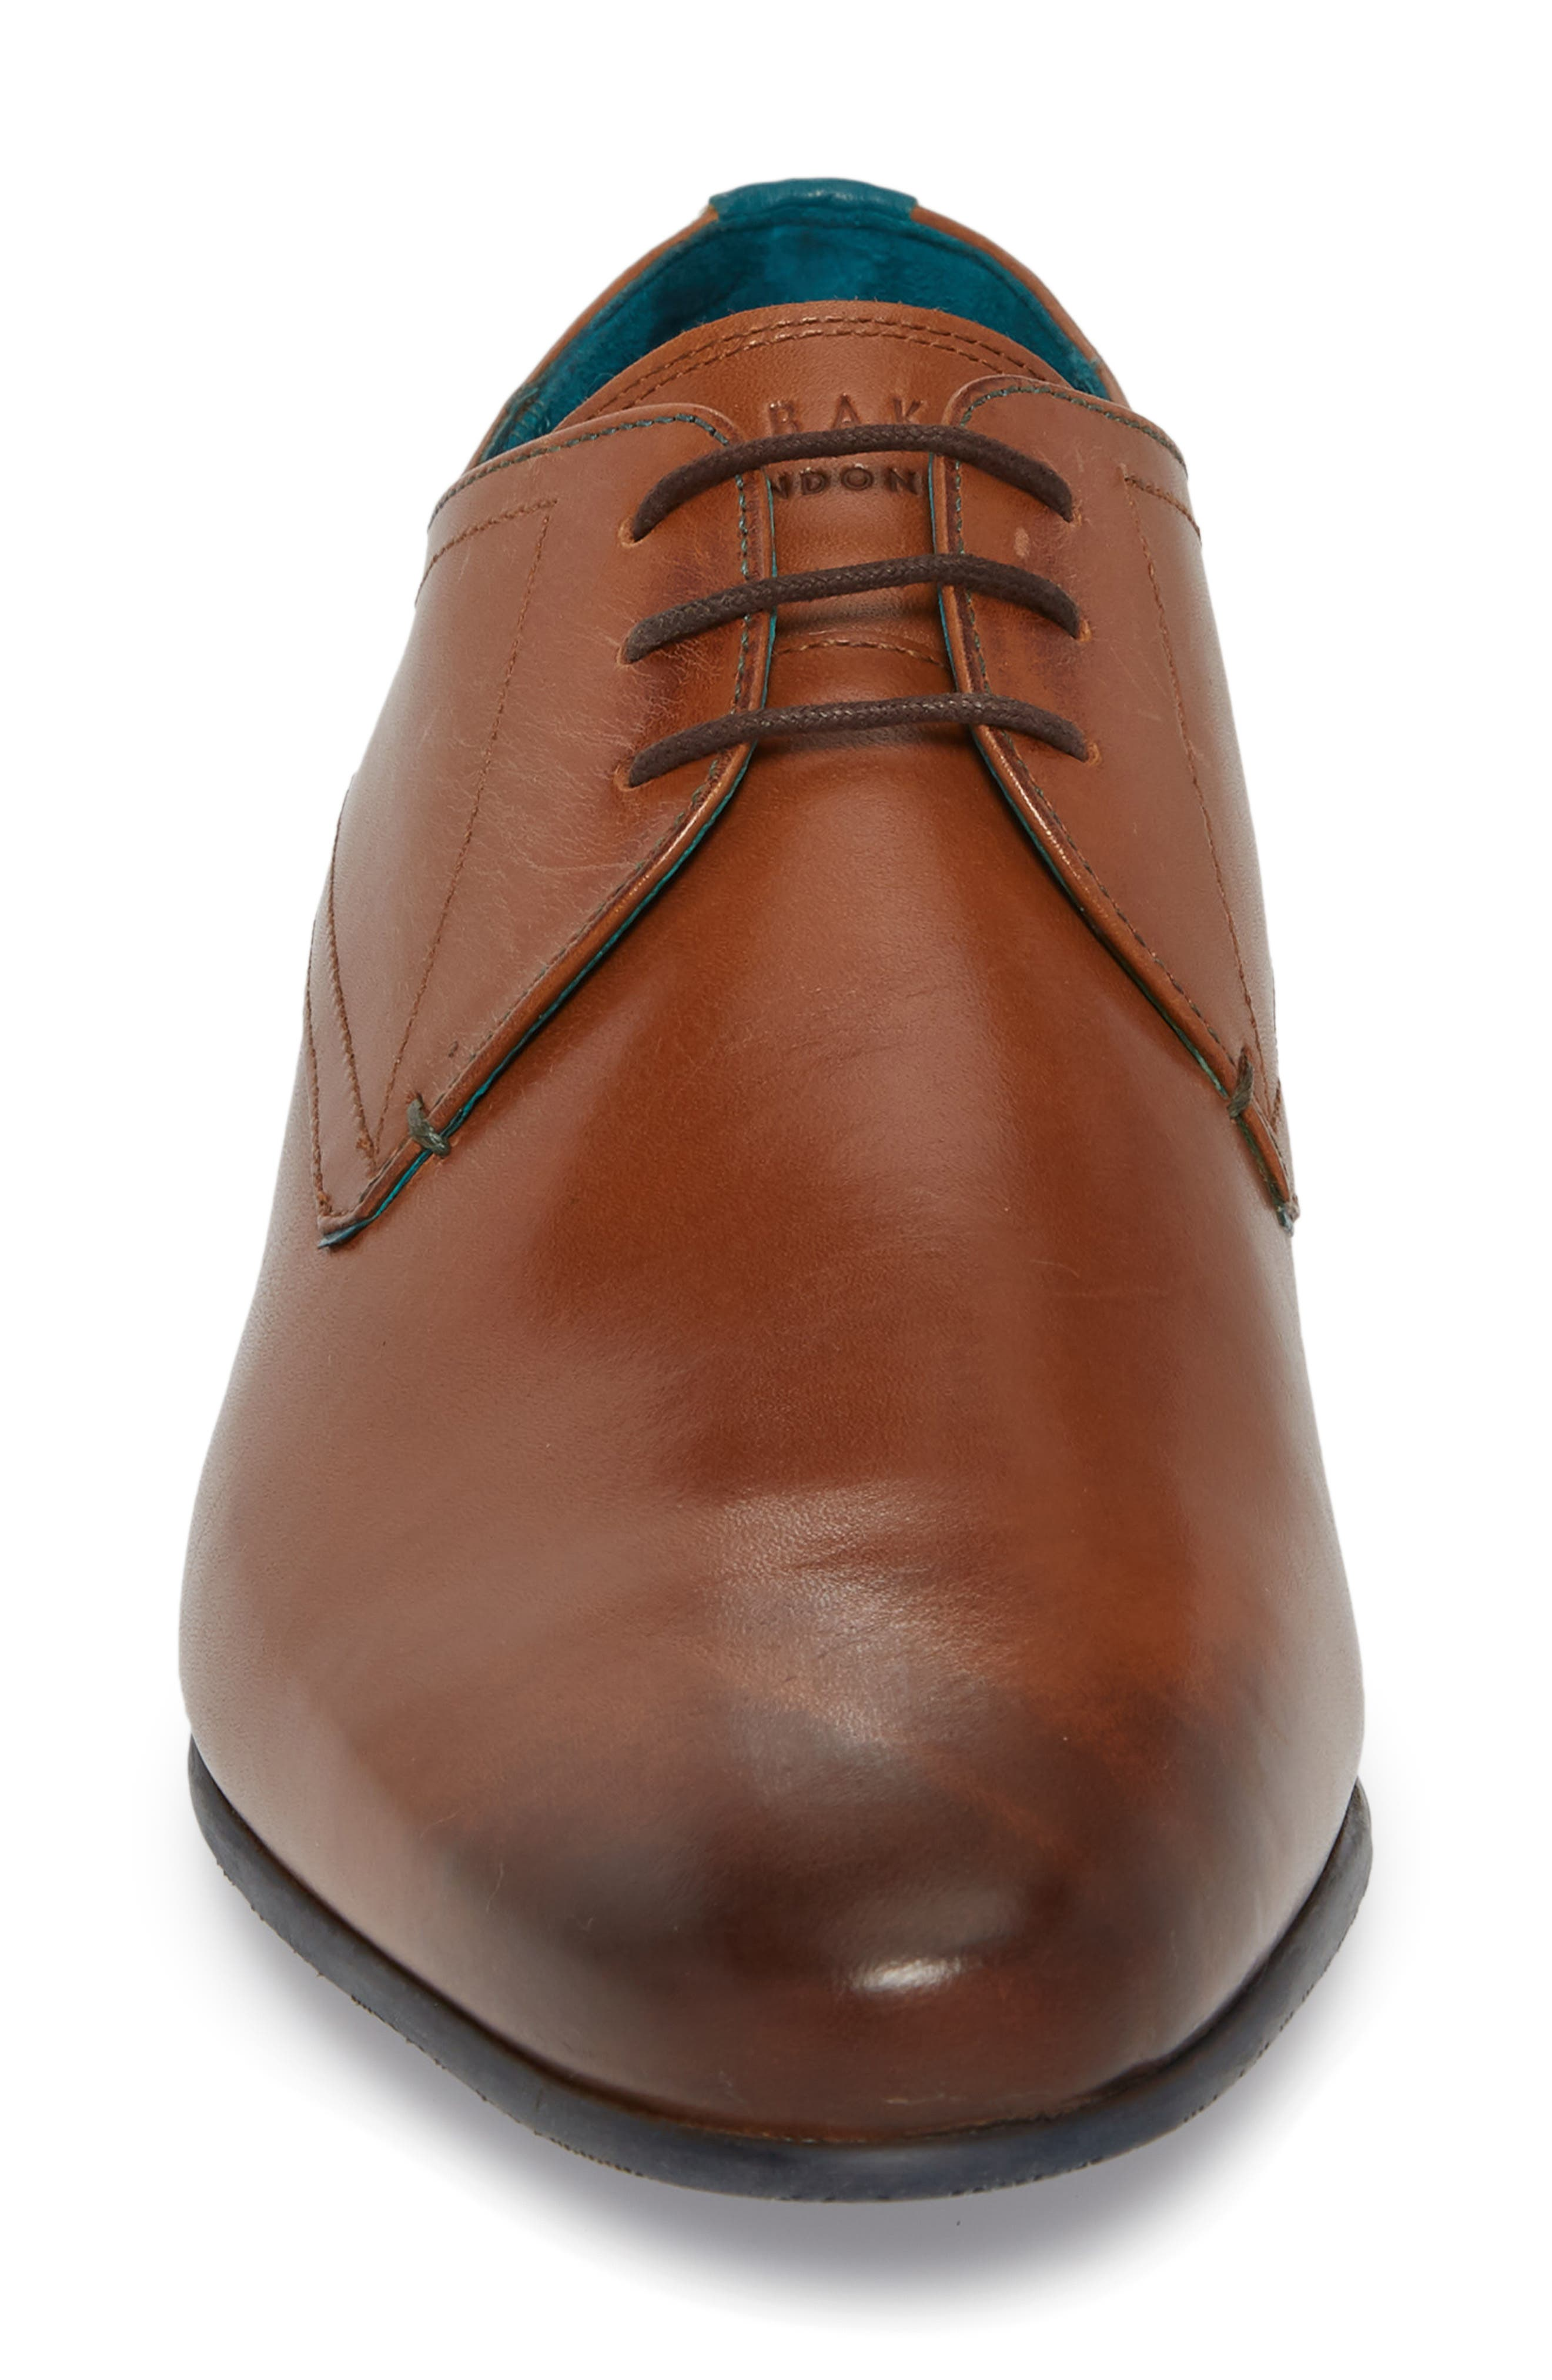 Bhartli Plain Toe Derby,                             Alternate thumbnail 4, color,                             Tan Leather